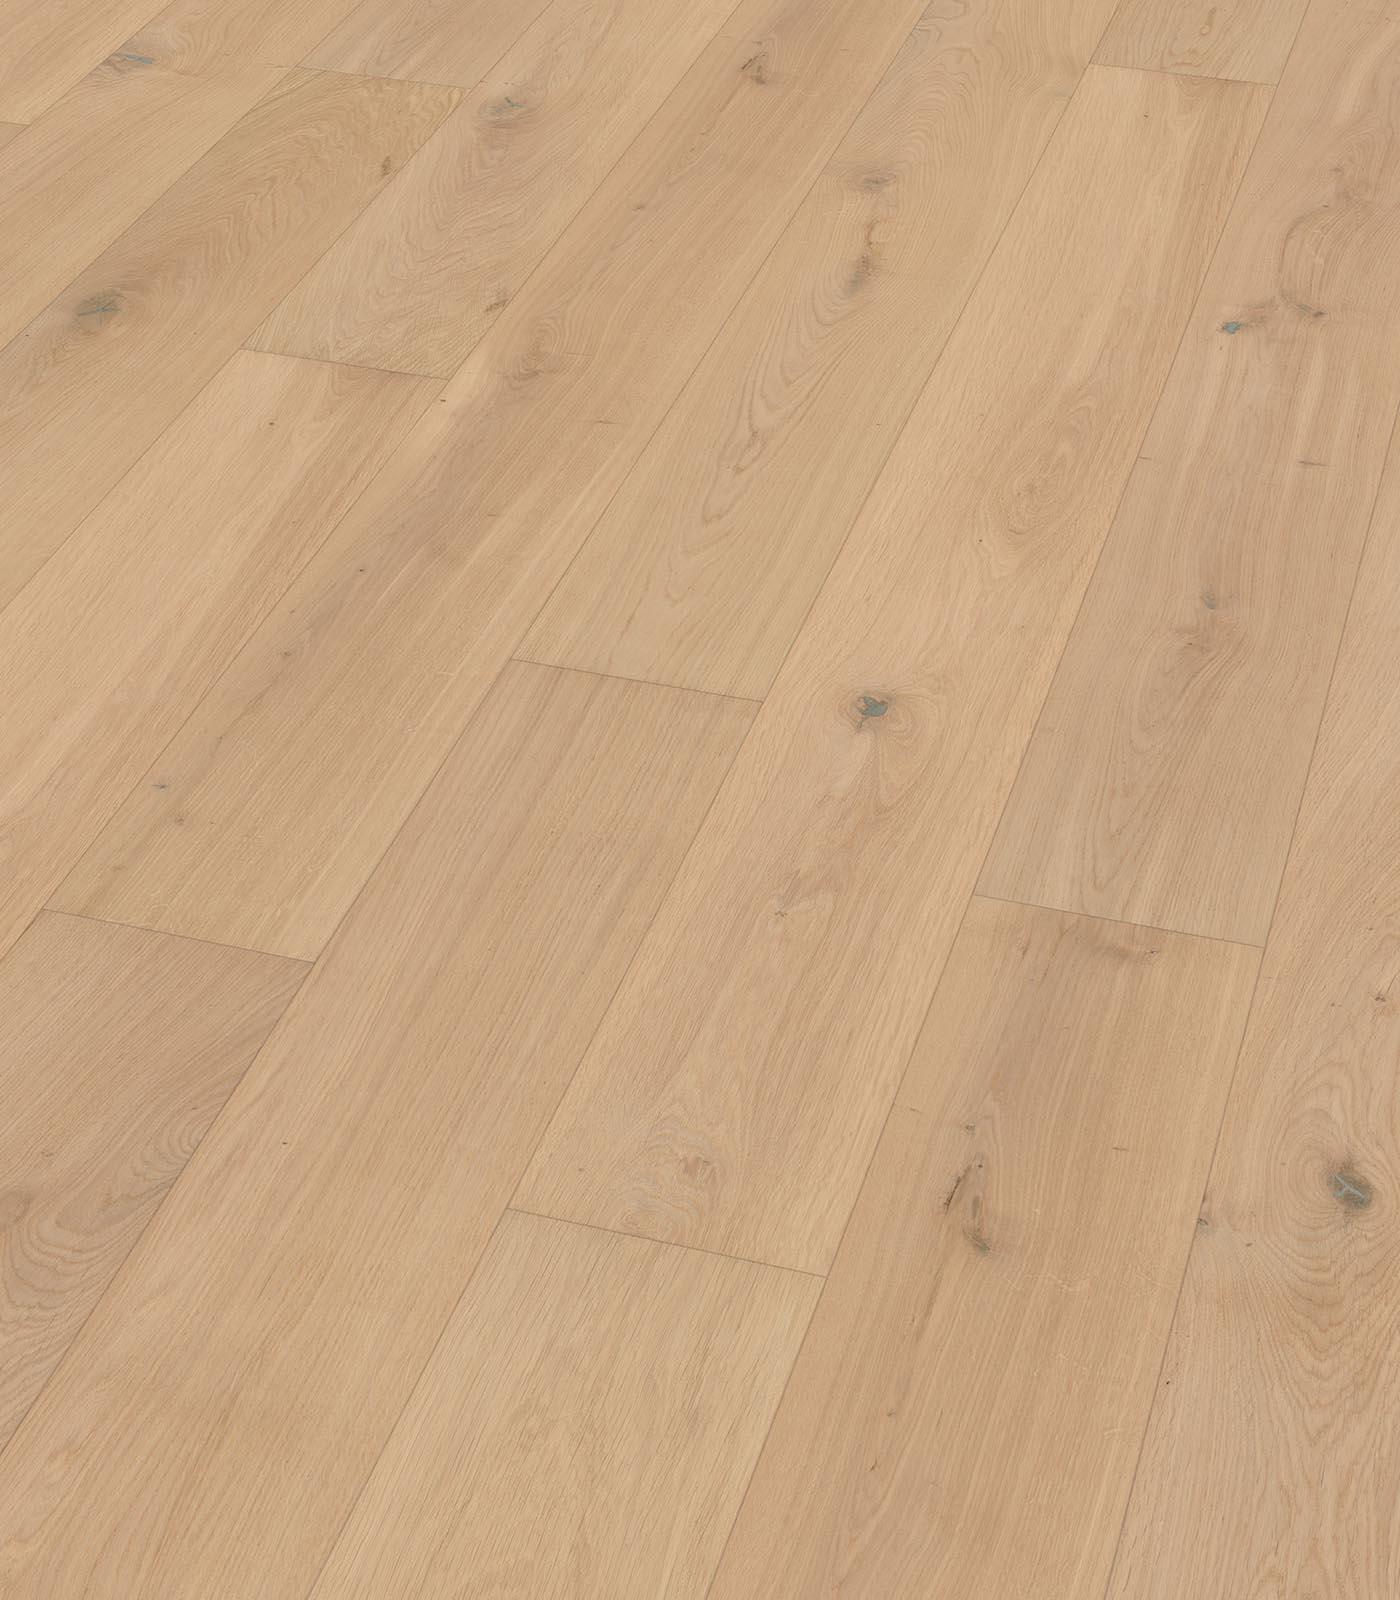 Absolute-Floors european Oak-Origins Collection-angle